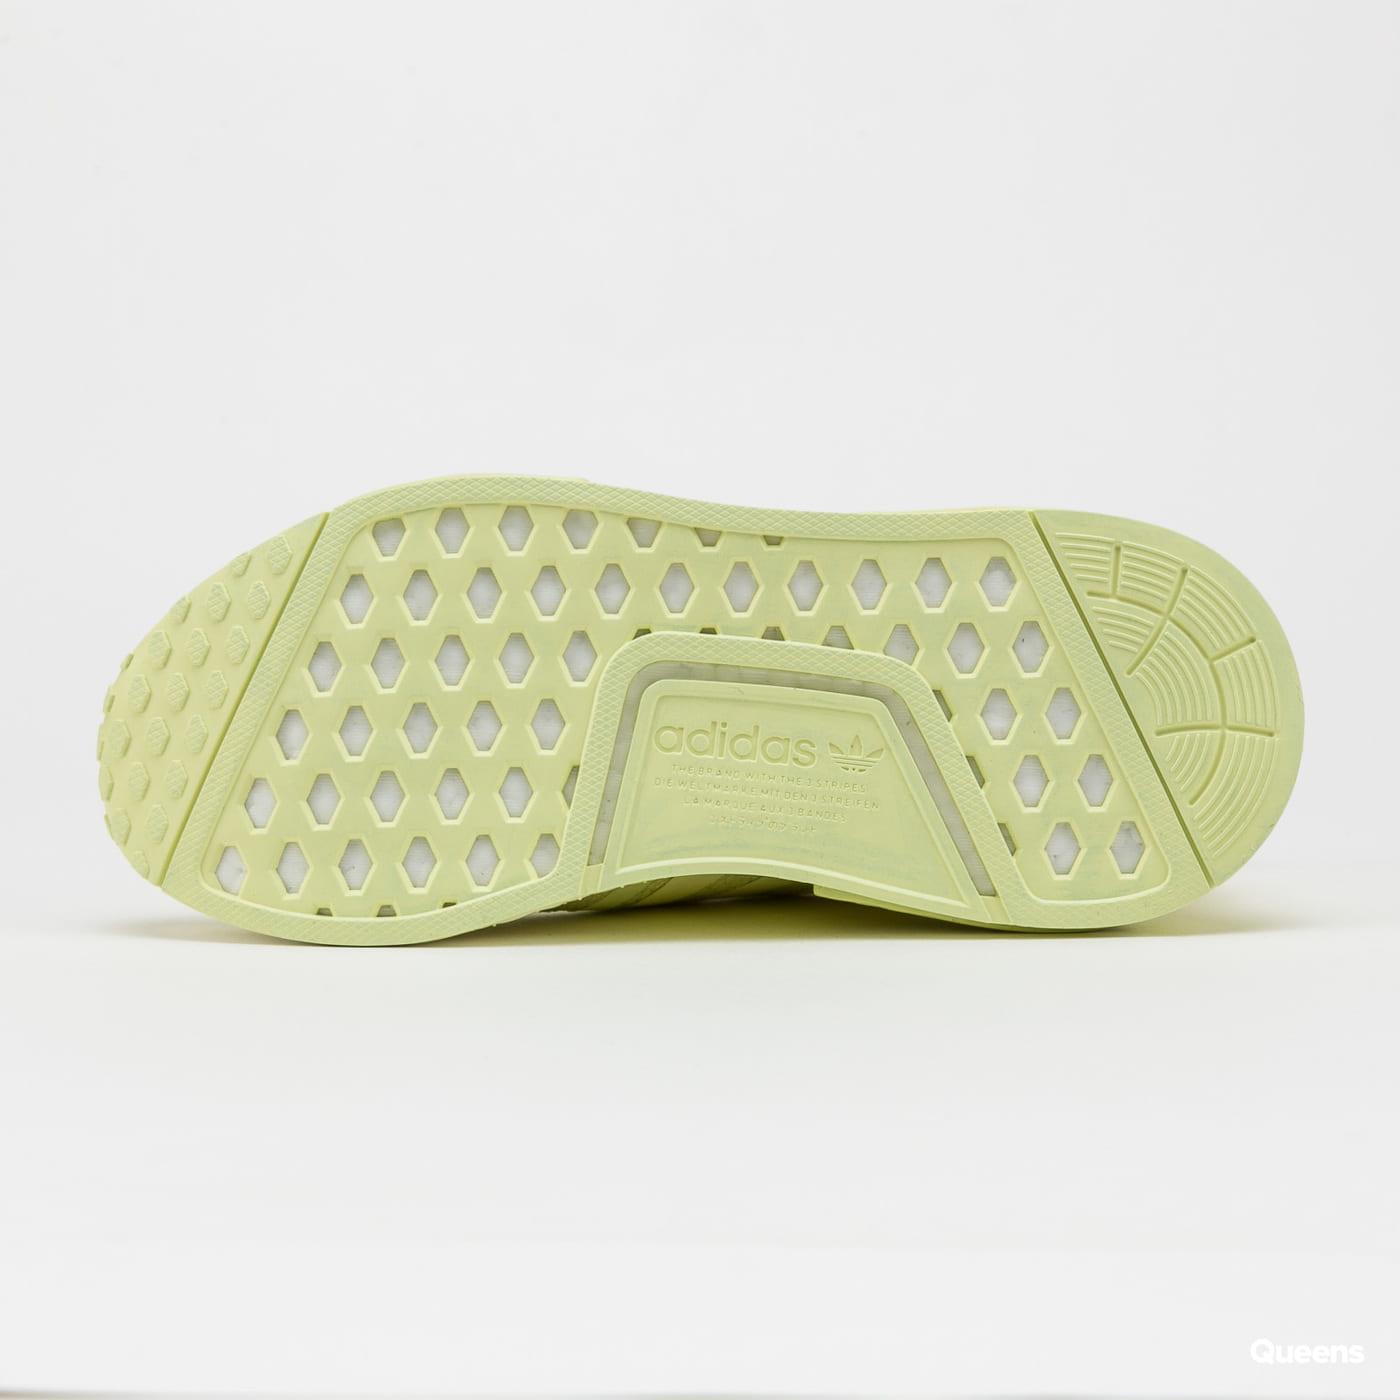 adidas Originals NMD_R1 yellow tint / yellow tint / cloud white